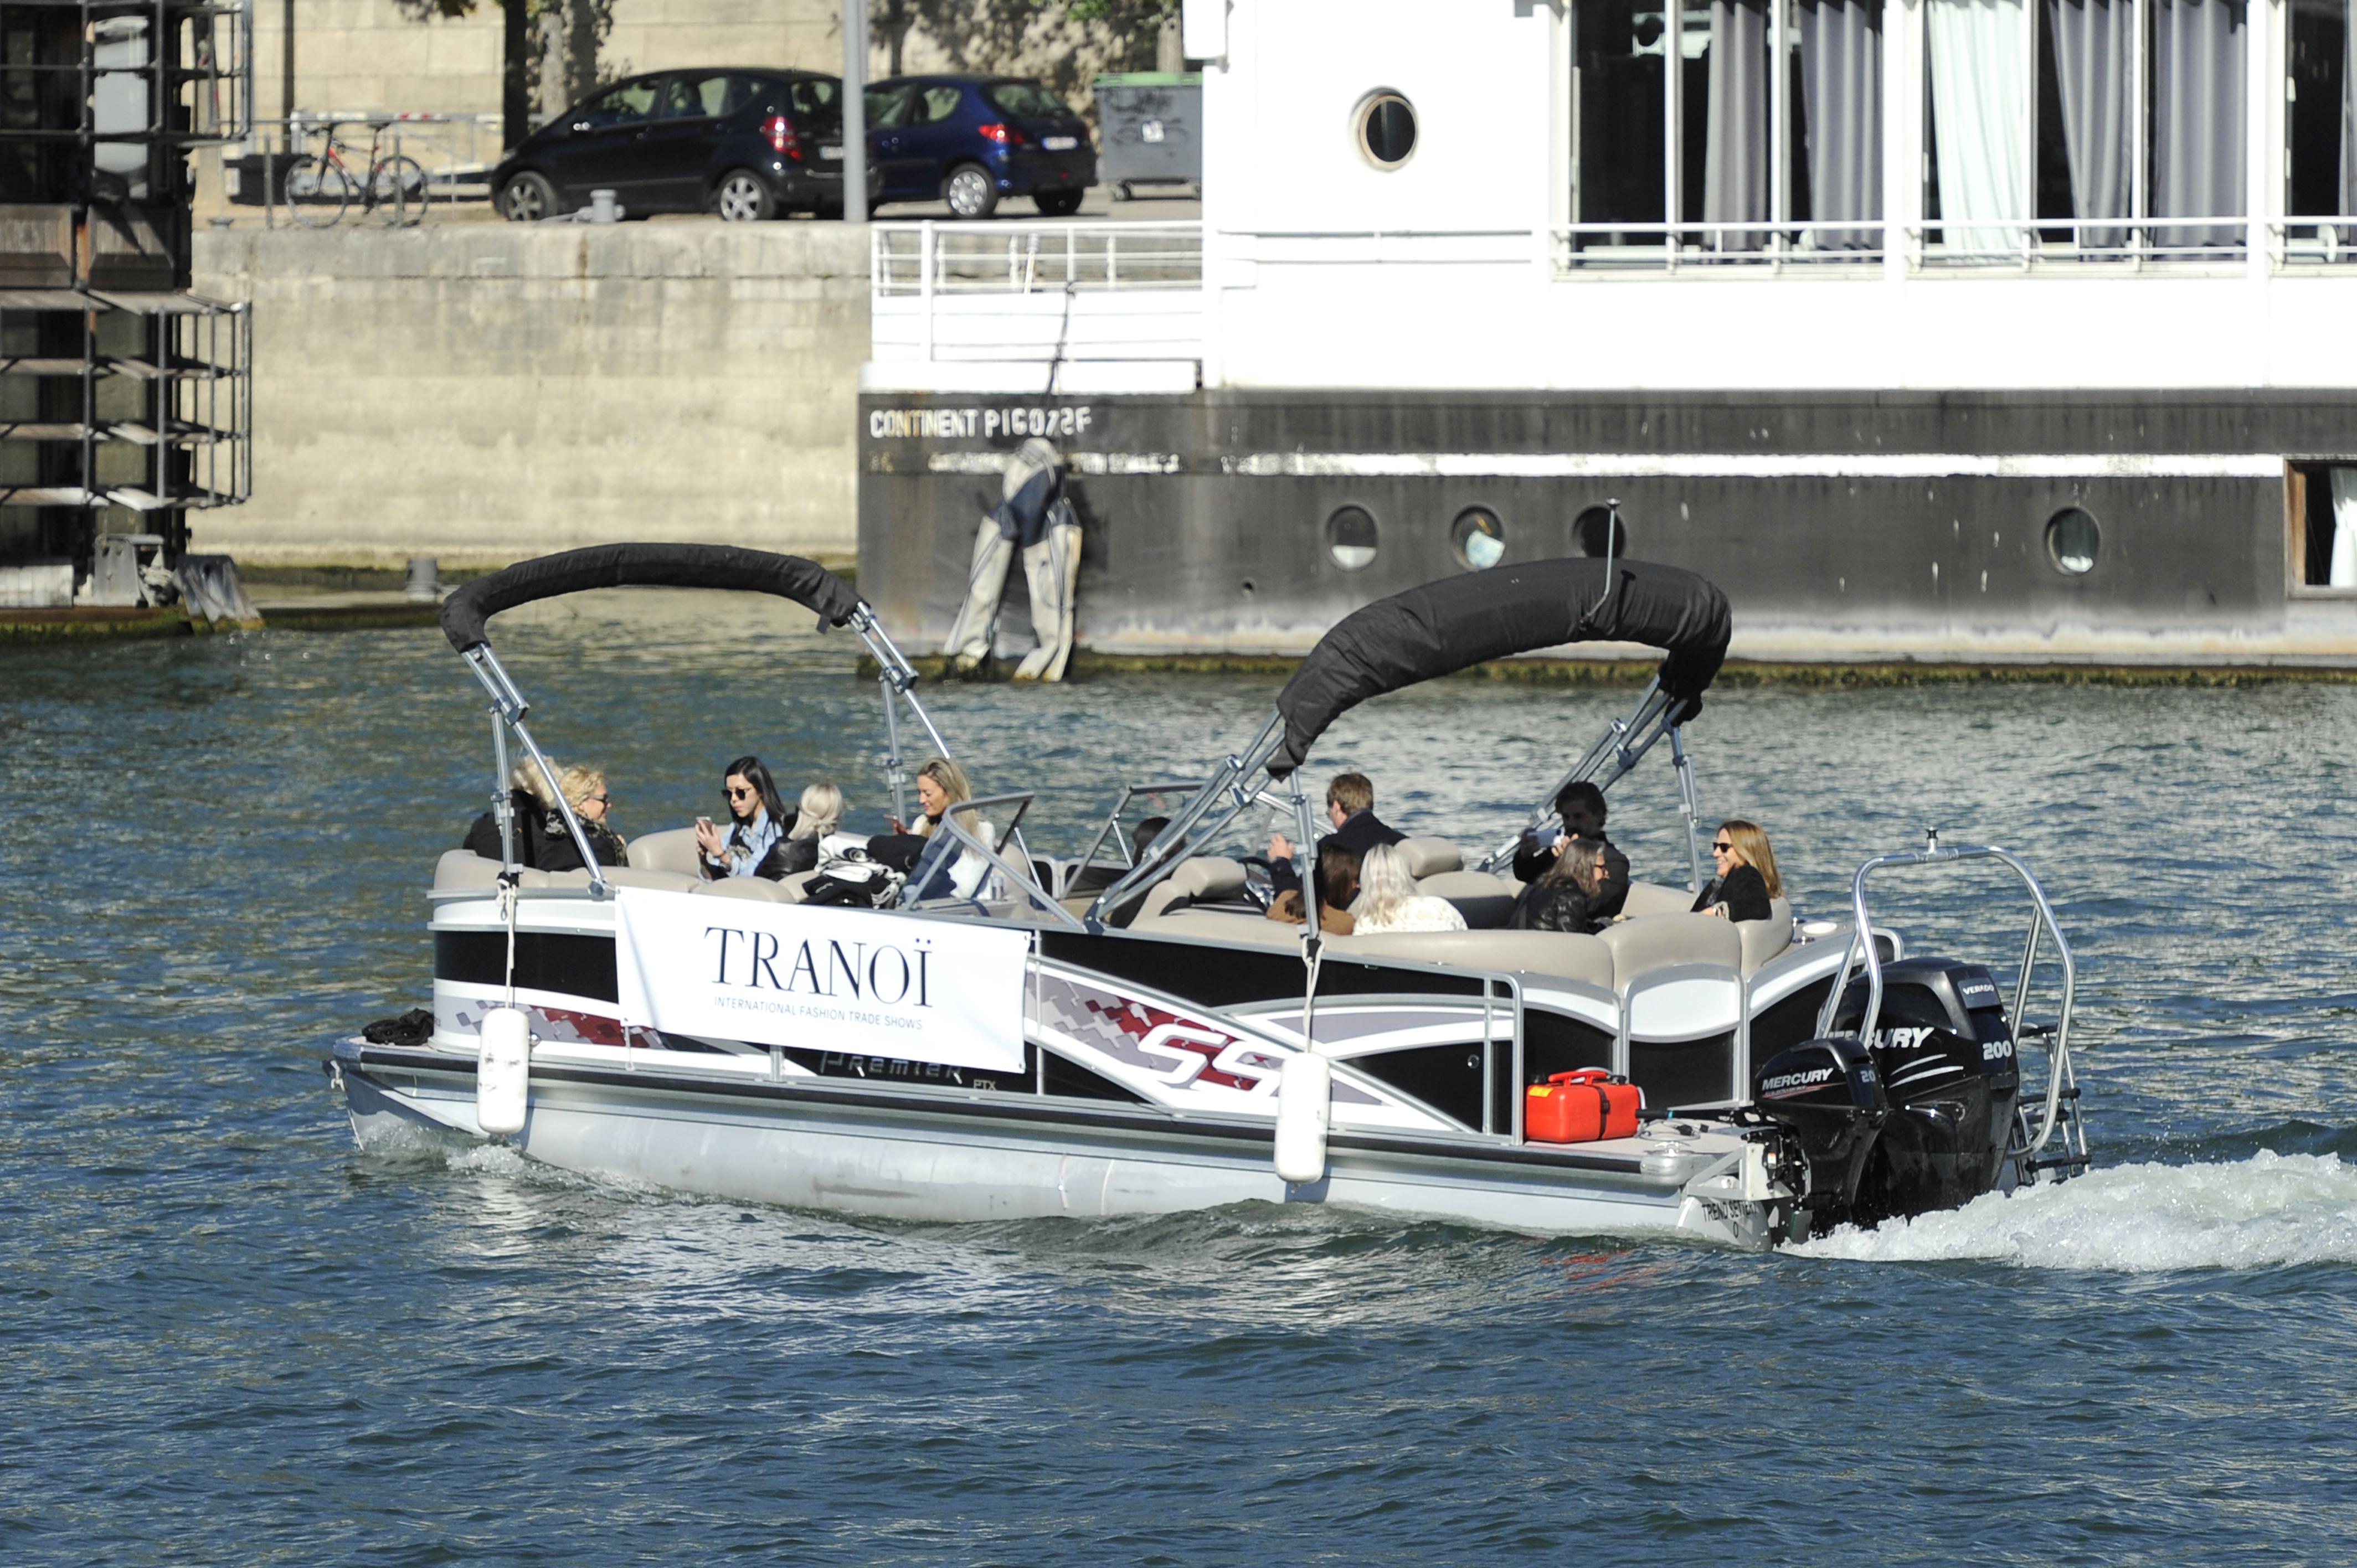 Avoiding Parisian traffic on the Tranoi shuttleboat